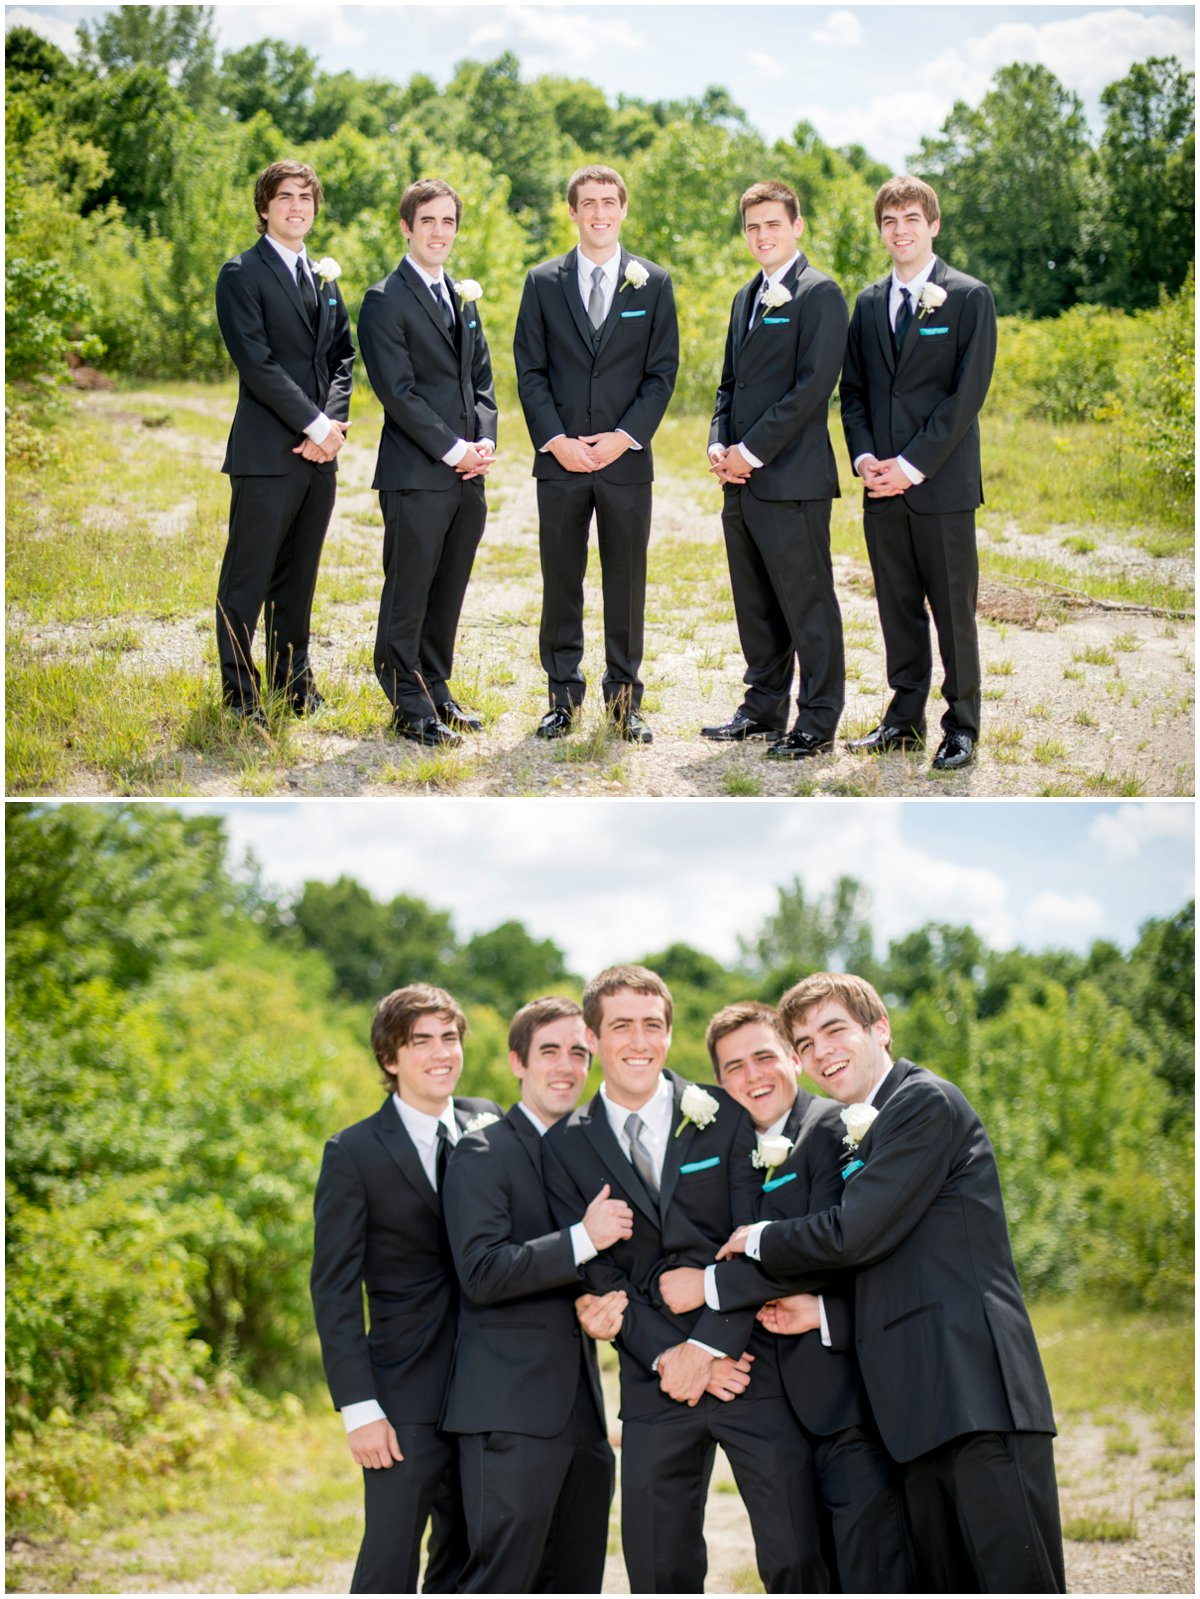 Mavris-wedding-pictures-Nate-Crouch-006.jpg